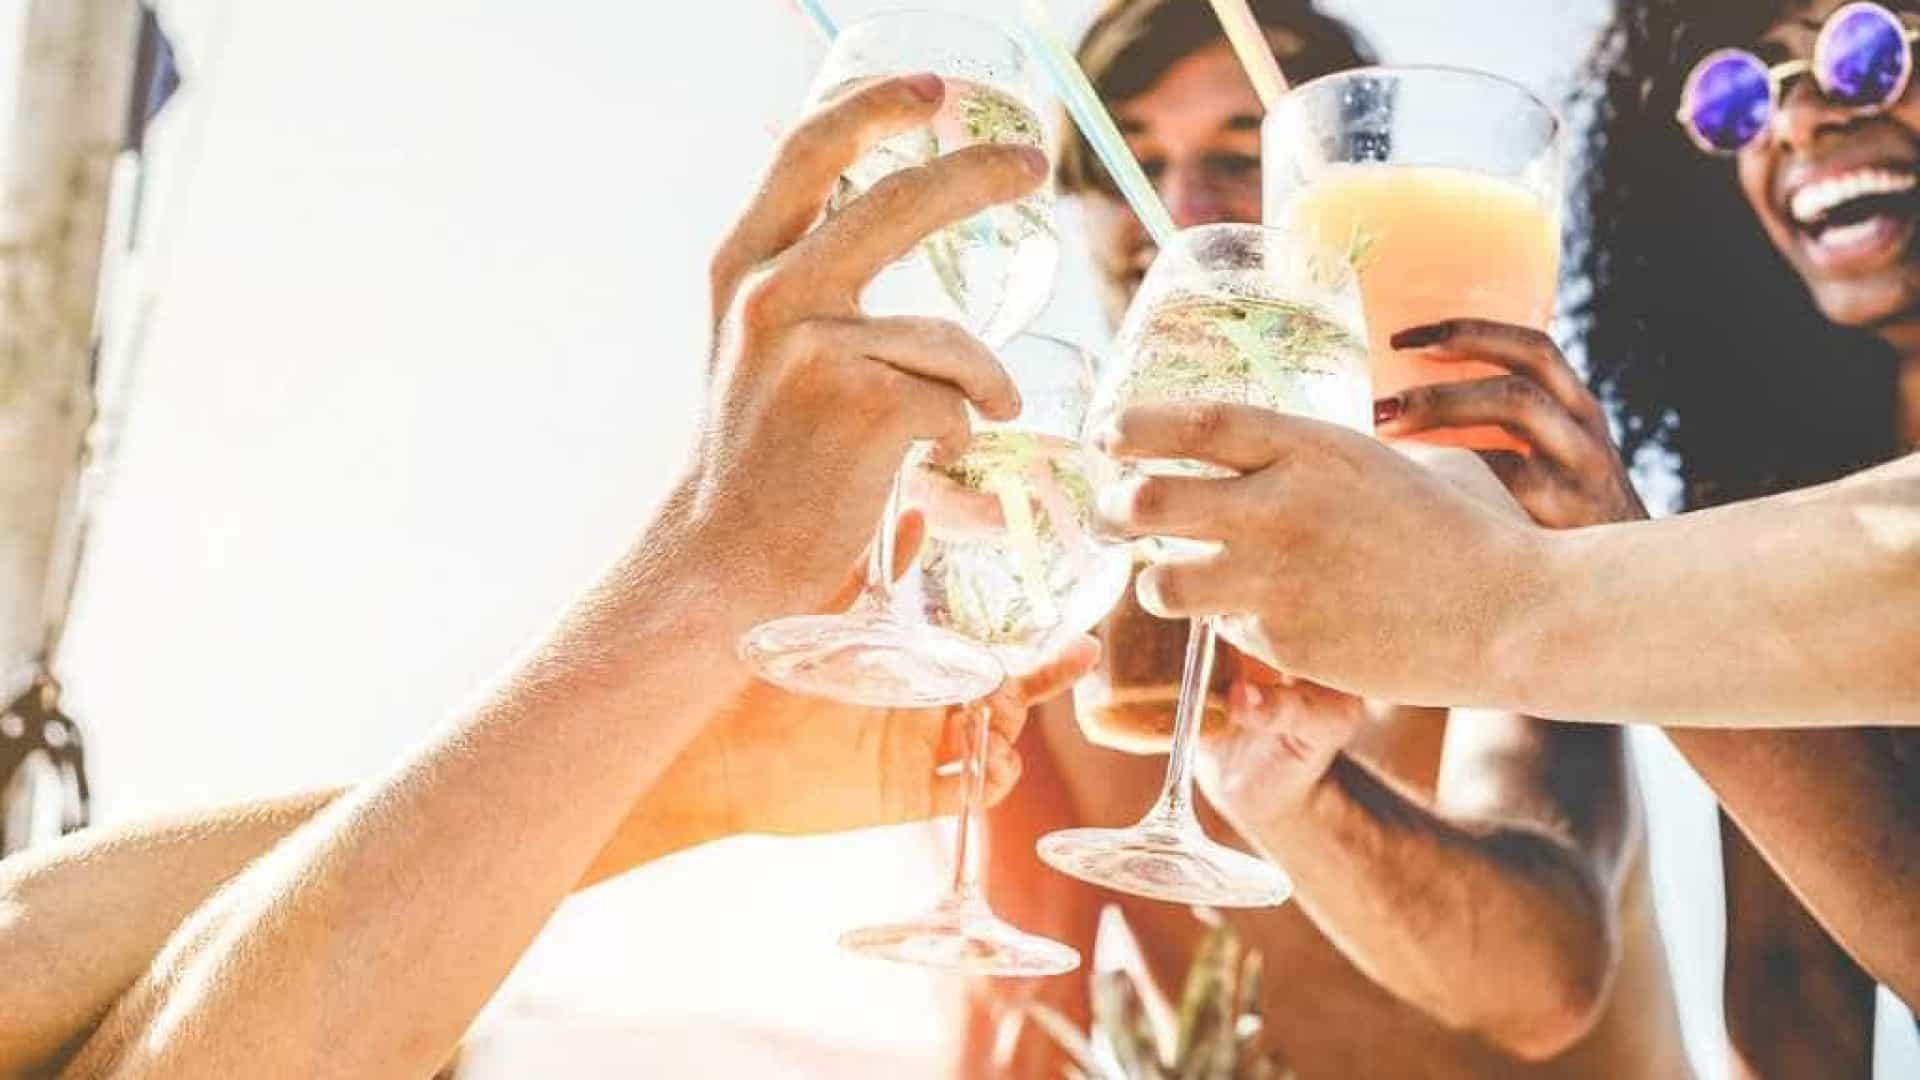 Alerta: bebida falsificada na folia pode cegar